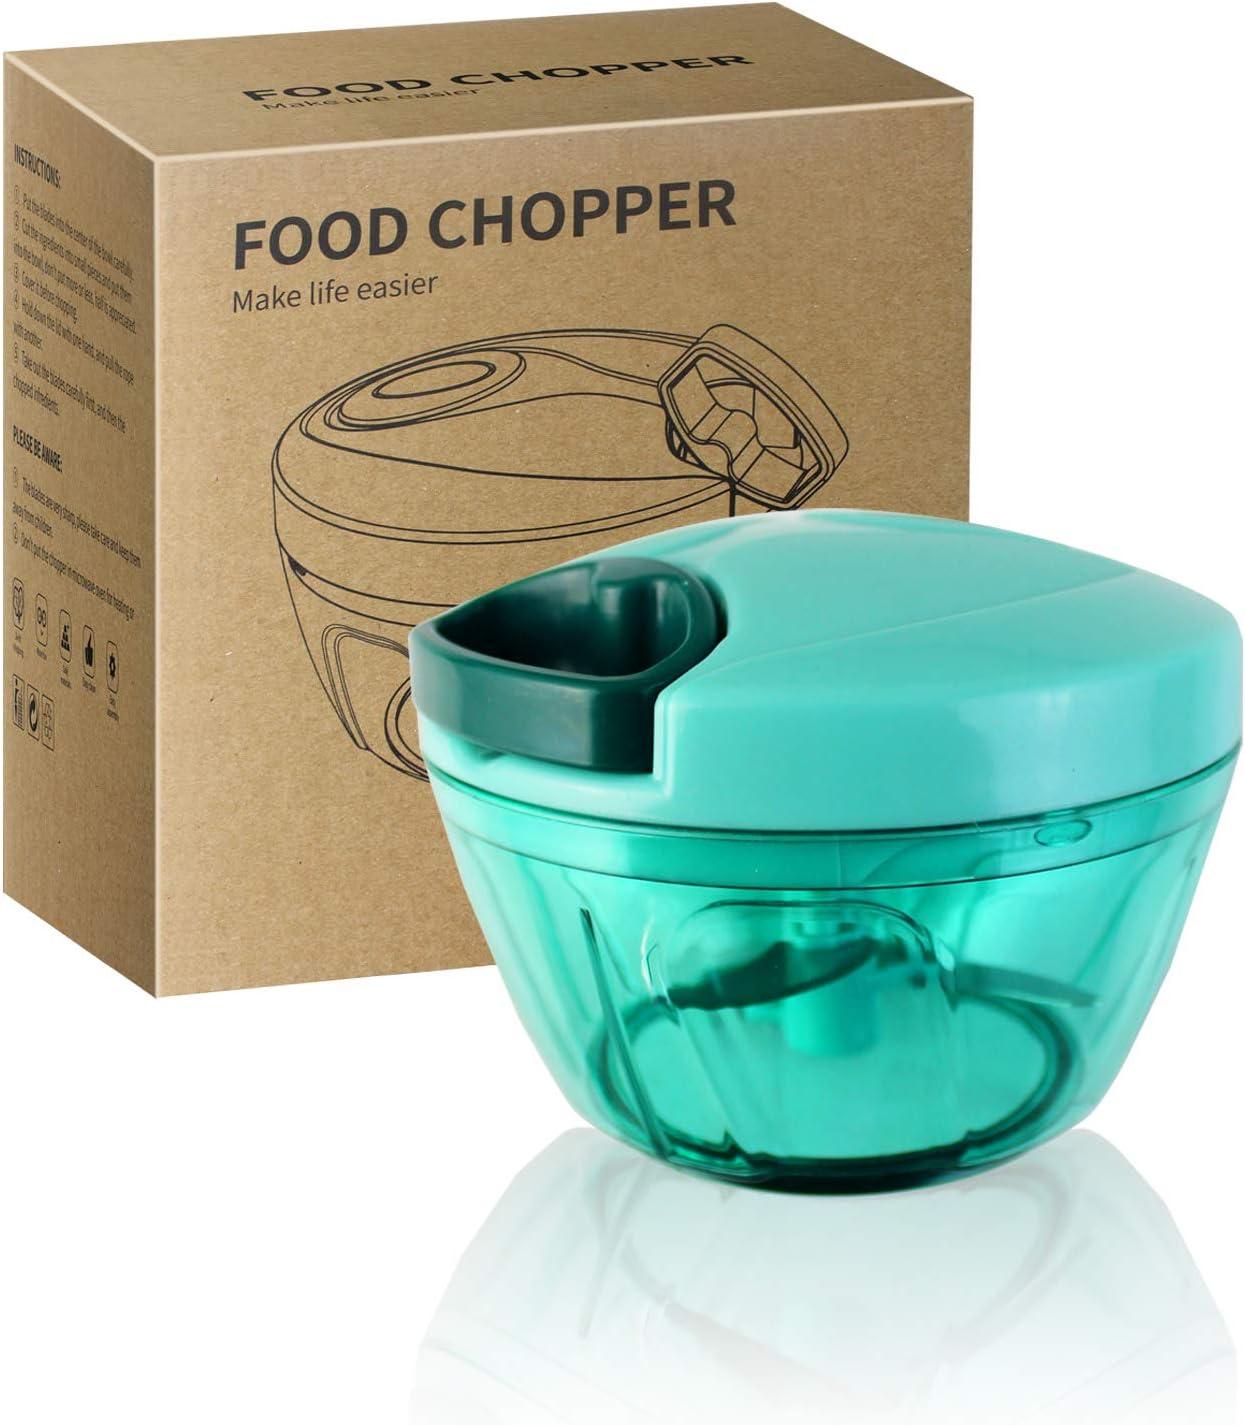 Shareway Manual Food Chopper Hand Pull Mincer Blender to Chop Fruits/Vegetables/Nuts/Herbs/Onions/Garlics for Salsa/Salad/Pesto/Coleslaw/Puree